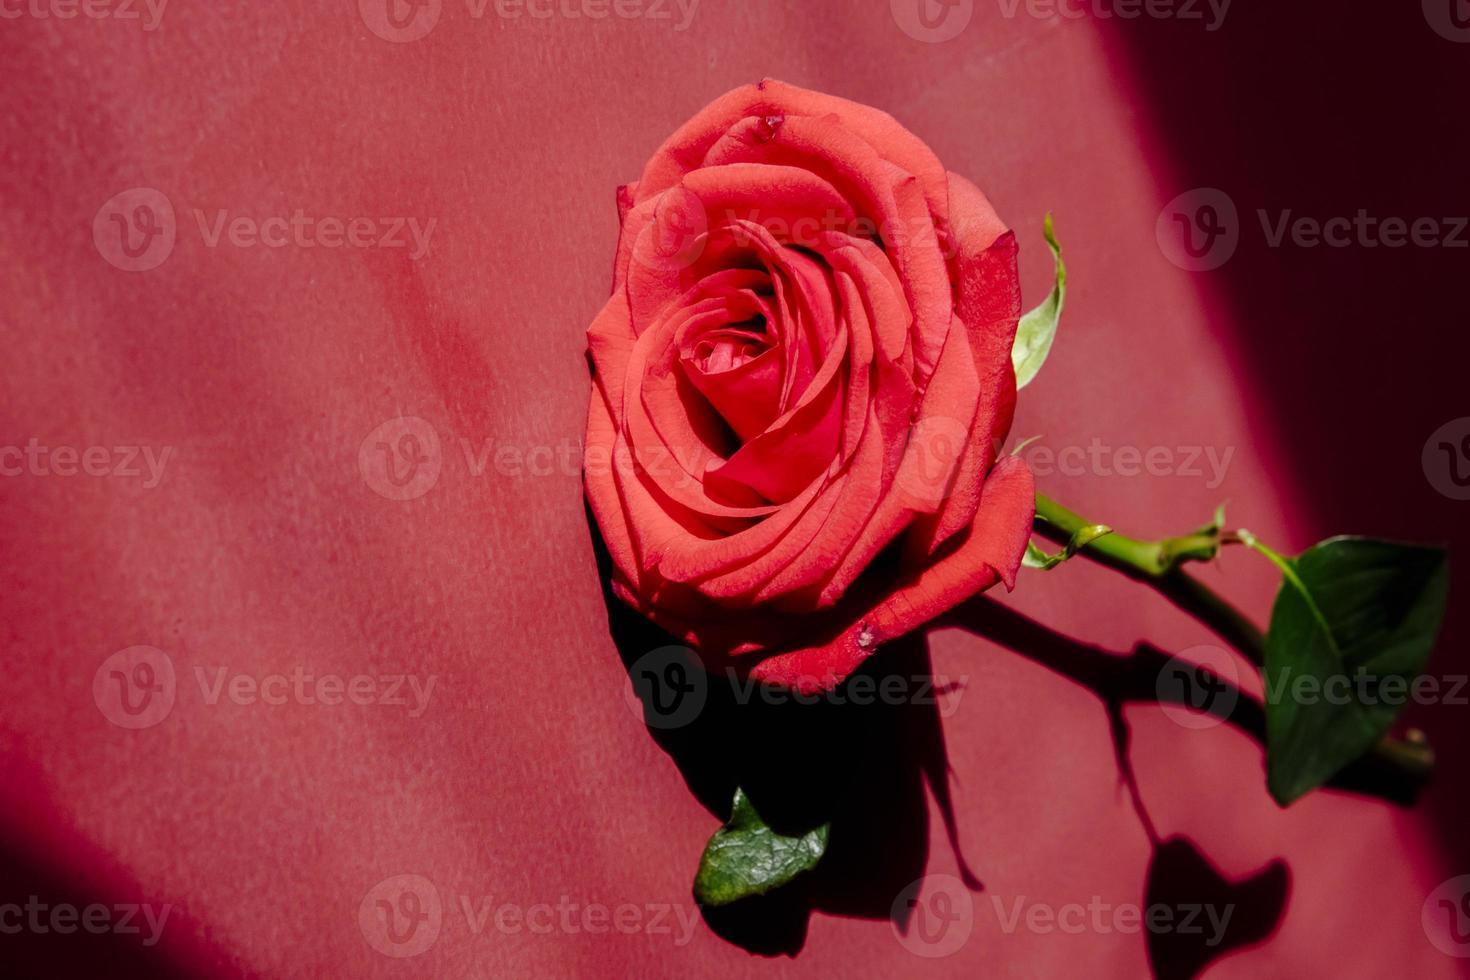 rode roos op rode achtergrond foto